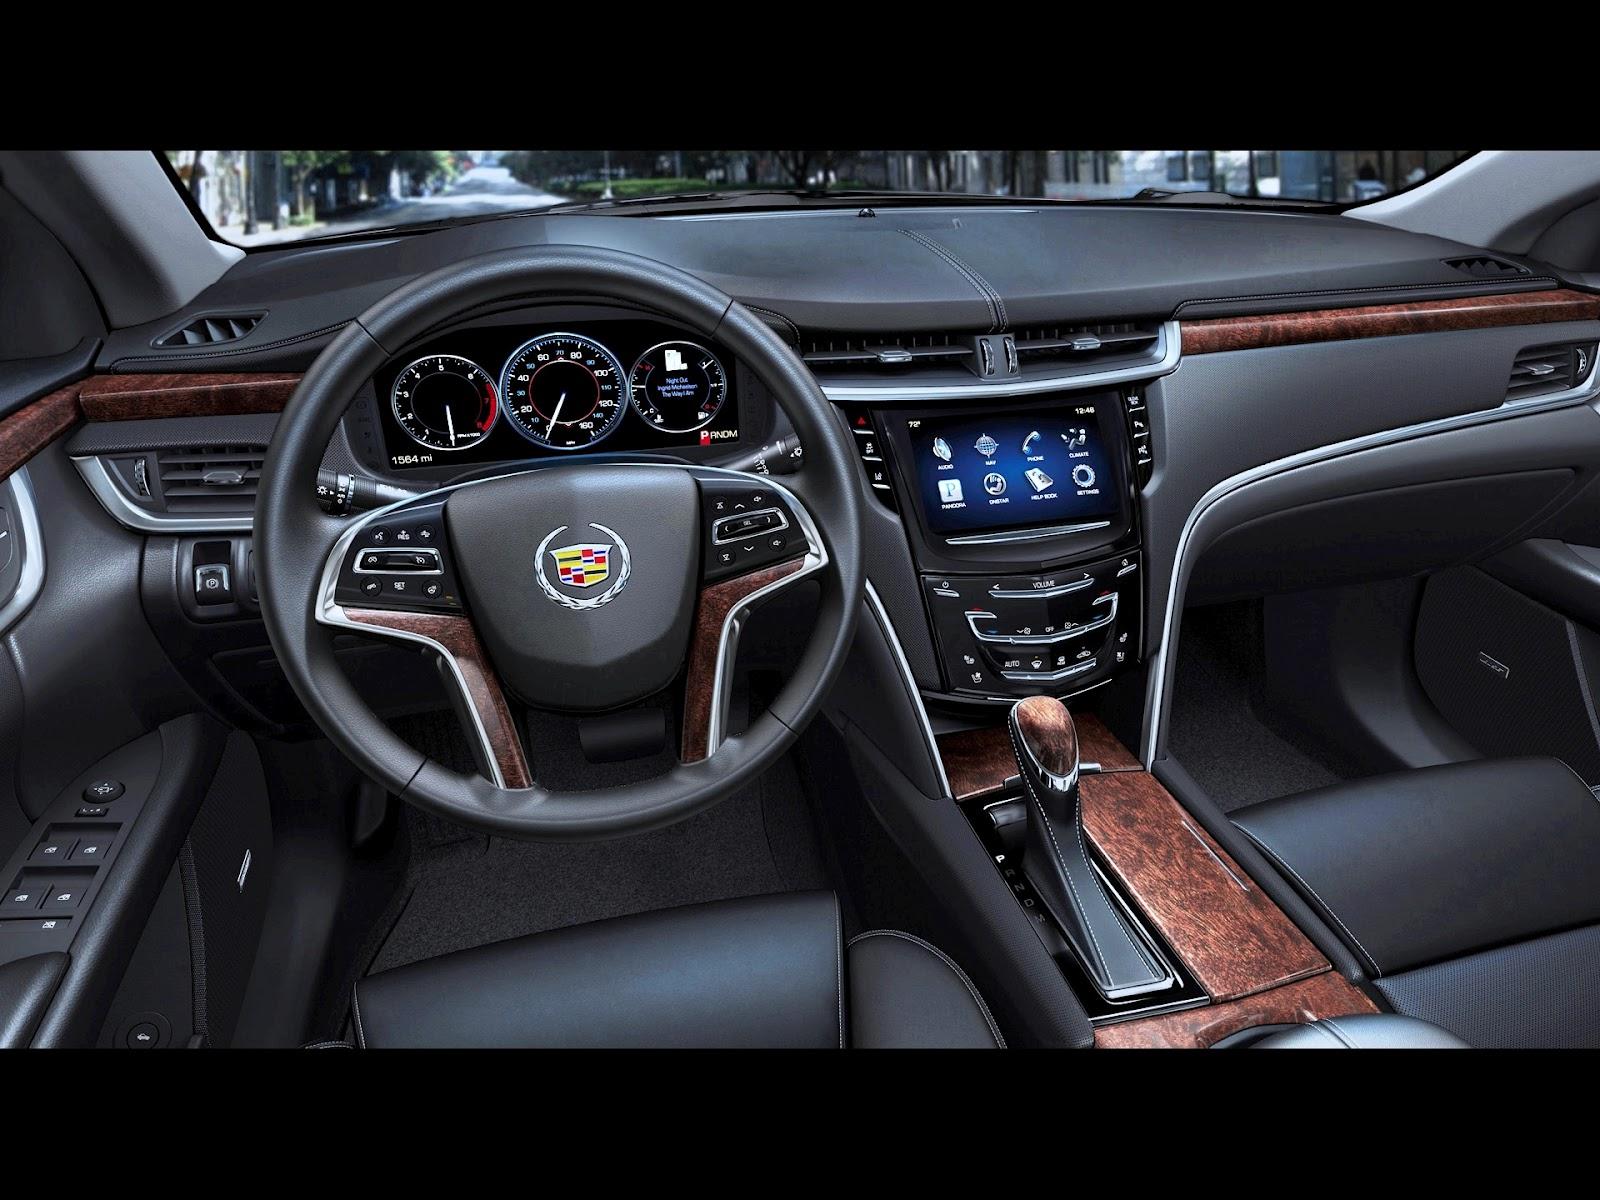 2013 Cadillac Xts Luxury Sedan News Hot Car